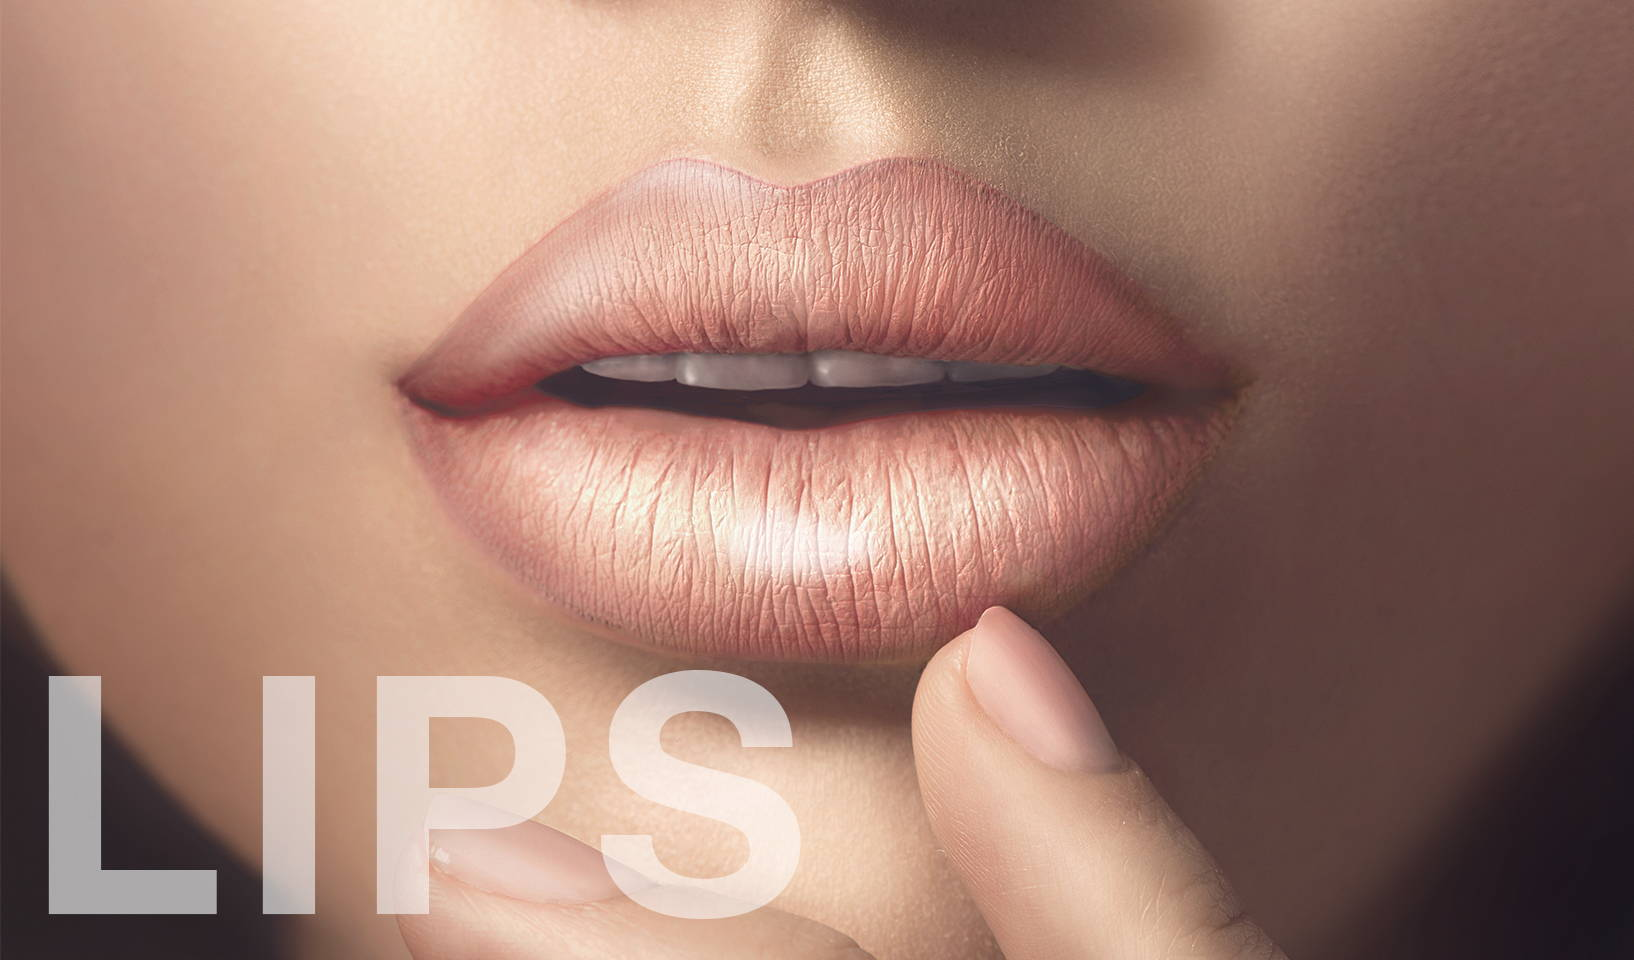 Nanacoco ProfessionalLip Makeup- lipstick, lip gloss, lip liner, lip creme